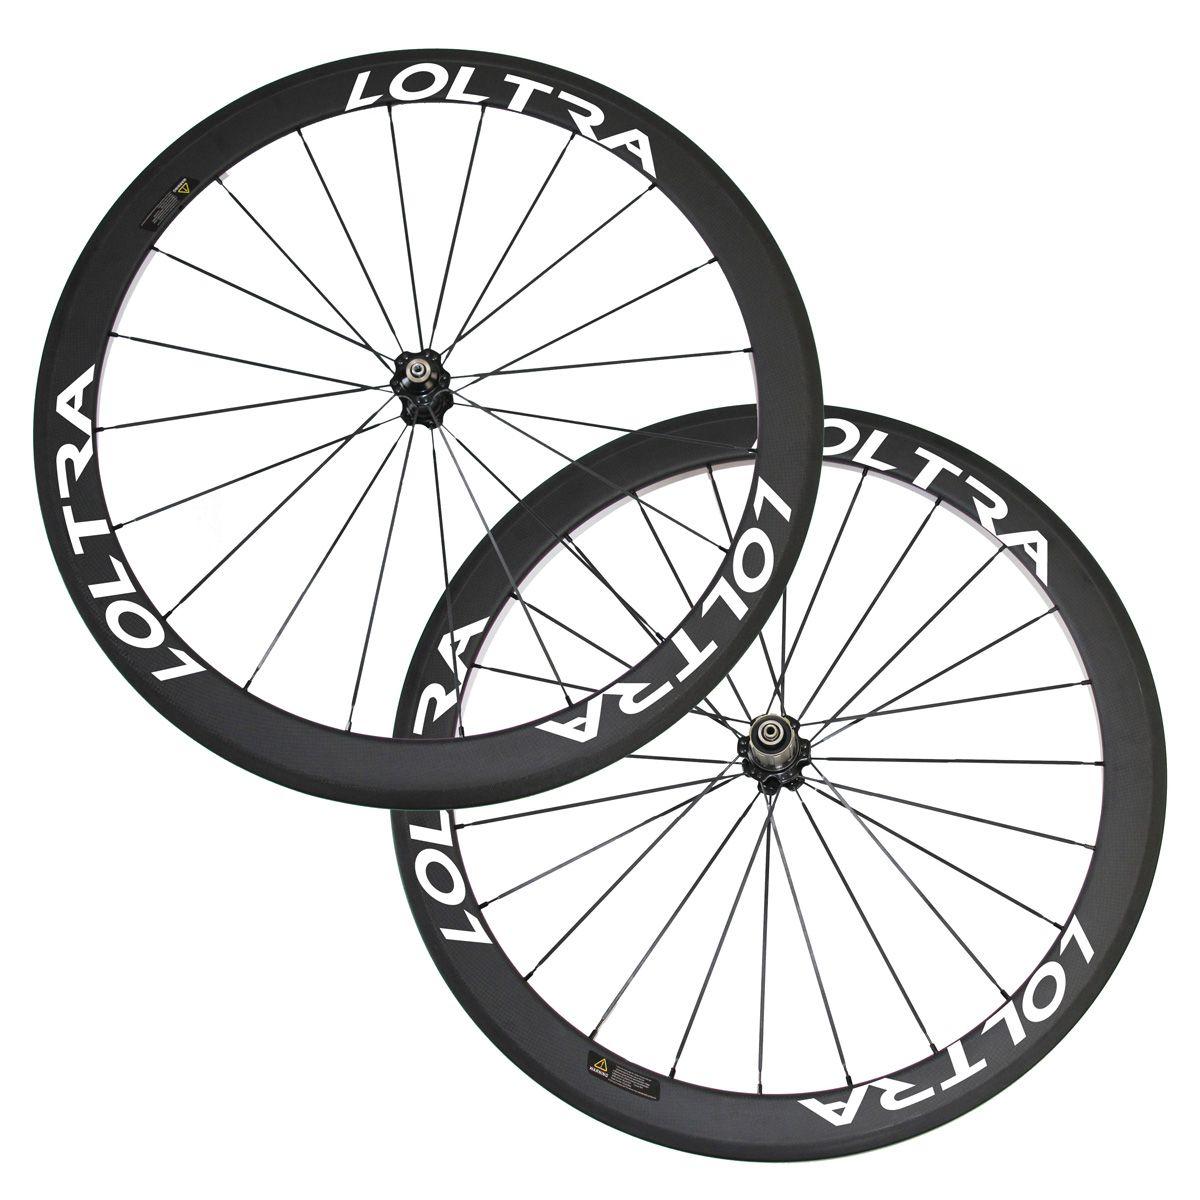 700C Full Carbon Bicycle Carbon Wheels 50mm Clincher Road Wheelset Black CN494 flat spokes Road Bike Wheels Loltra racing bike